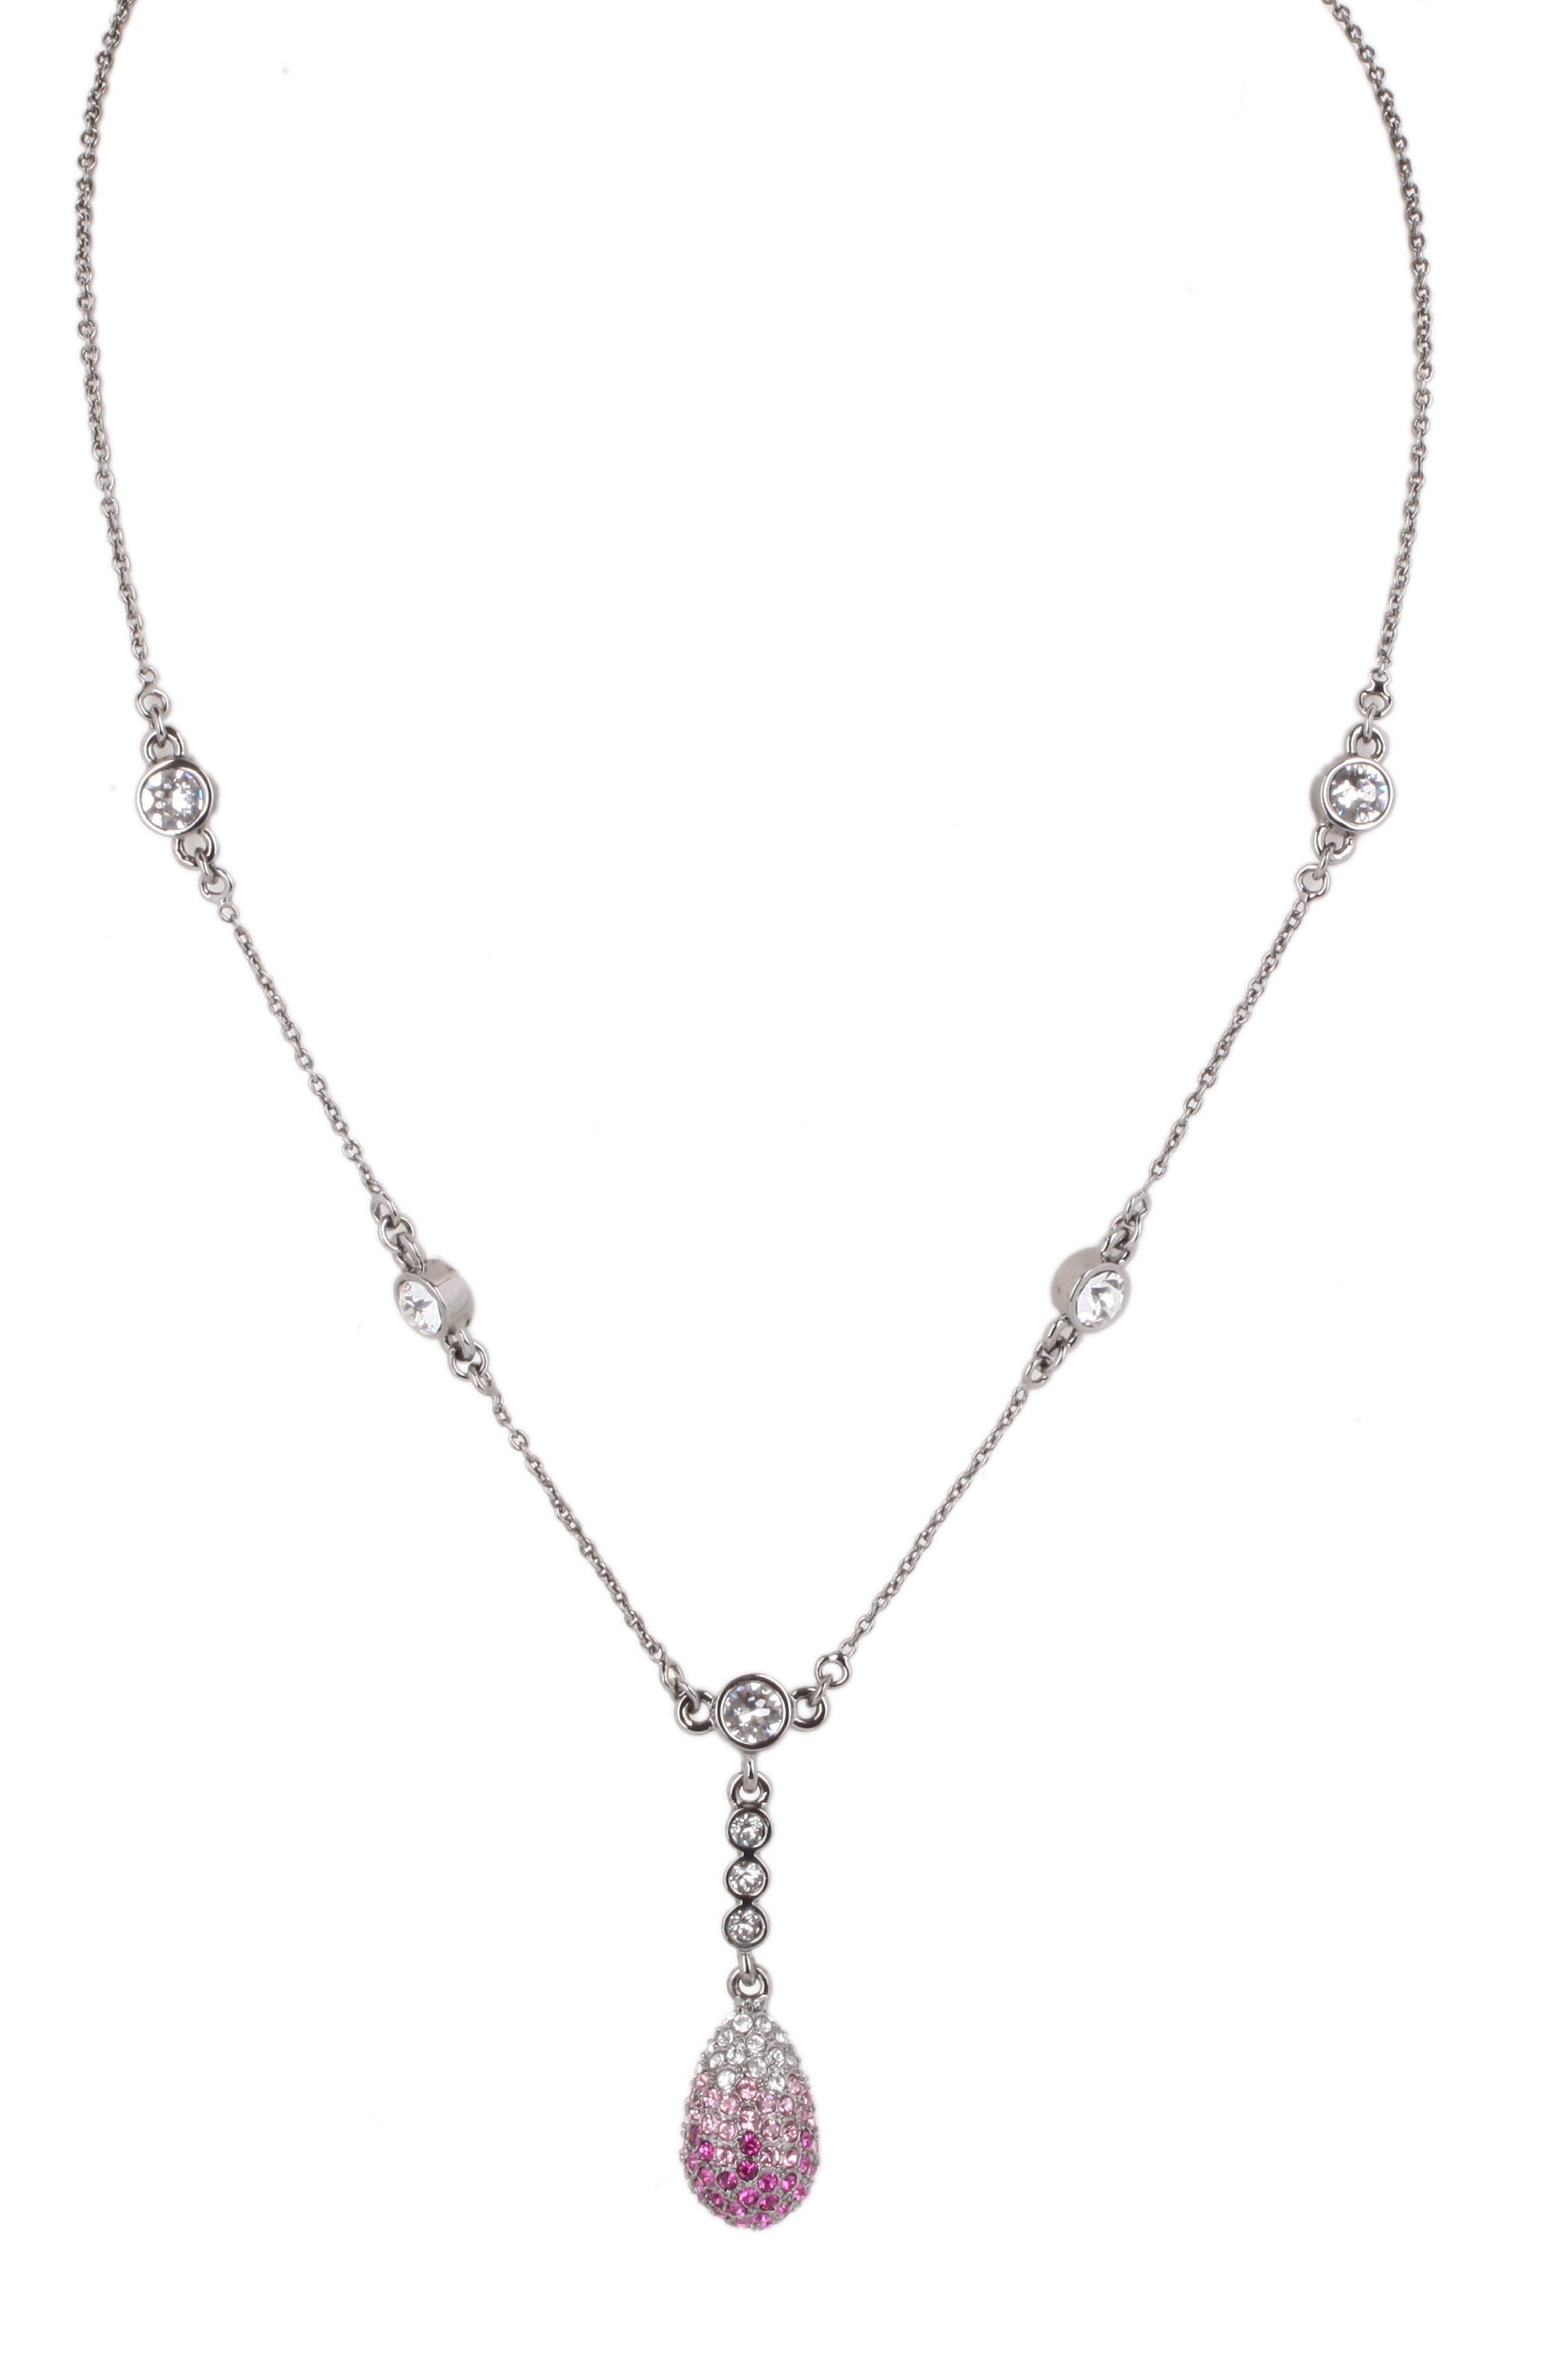 Pavé Swarovski Crystal Pendant Necklace,                             Main thumbnail 1, color,                             FUCHSIA/ SILVER